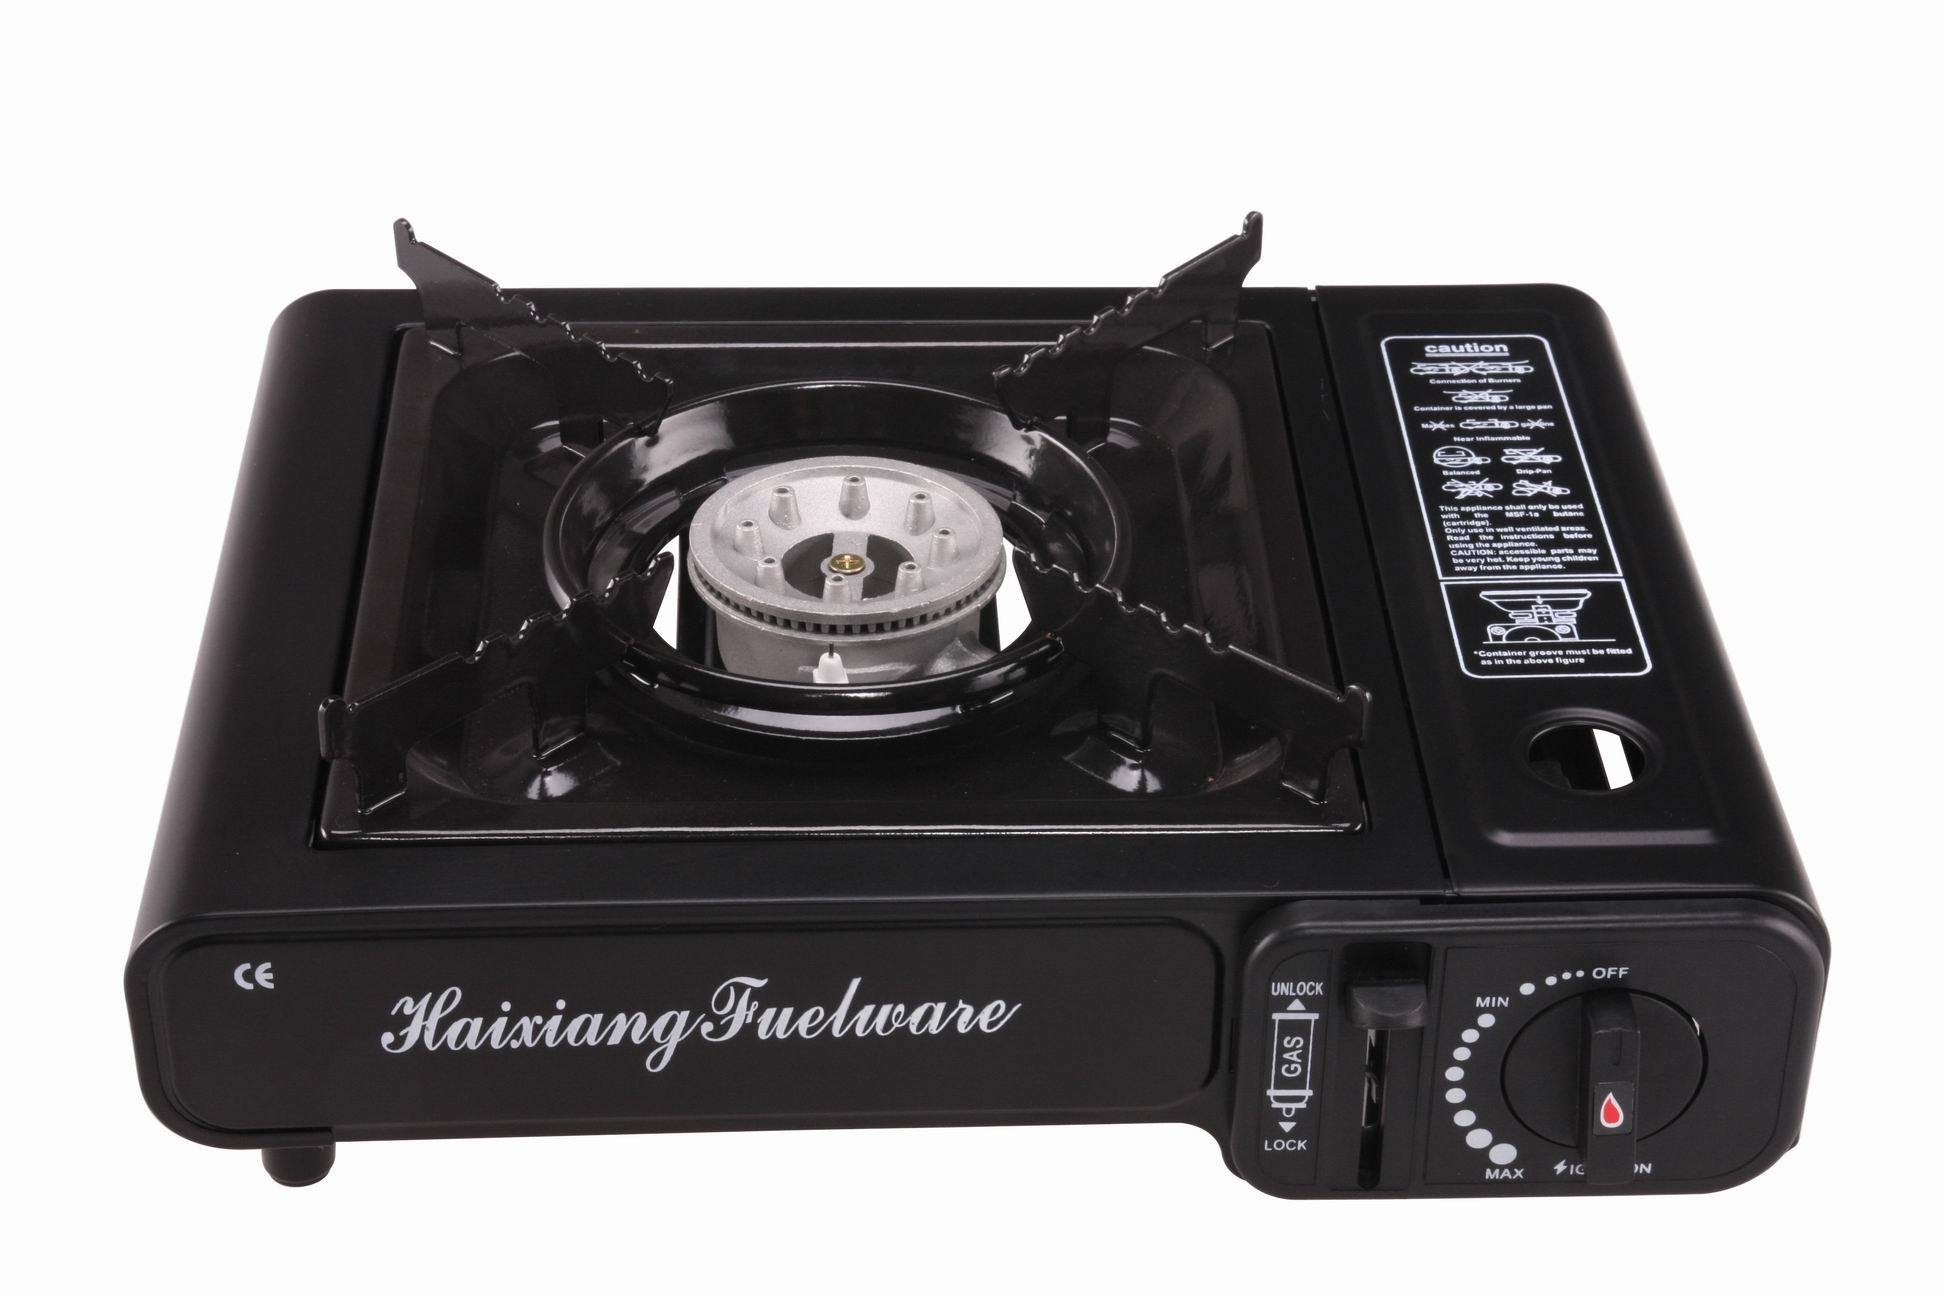 stoves portable gas stove. Black Bedroom Furniture Sets. Home Design Ideas